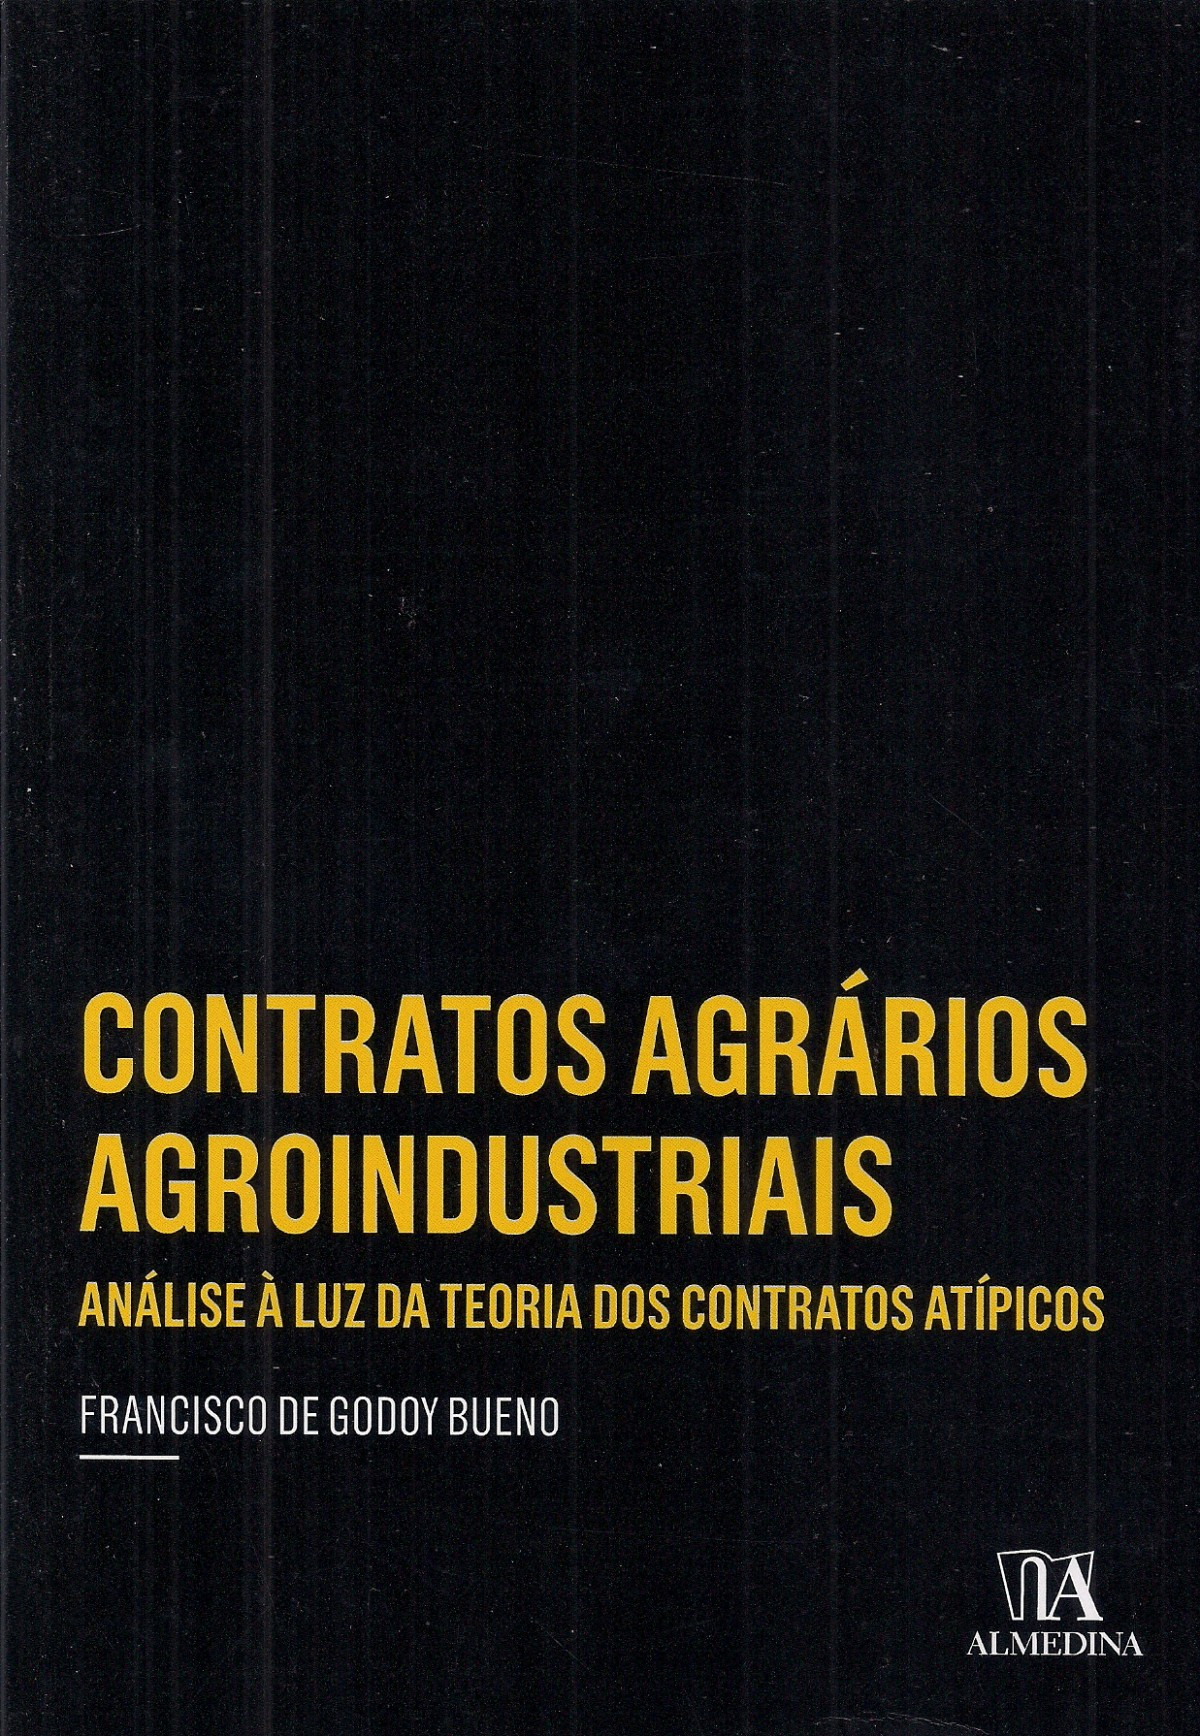 Foto 1 - Contratos Agrários Agroindustriais - análise á luz da teoria dos contratos atípicos